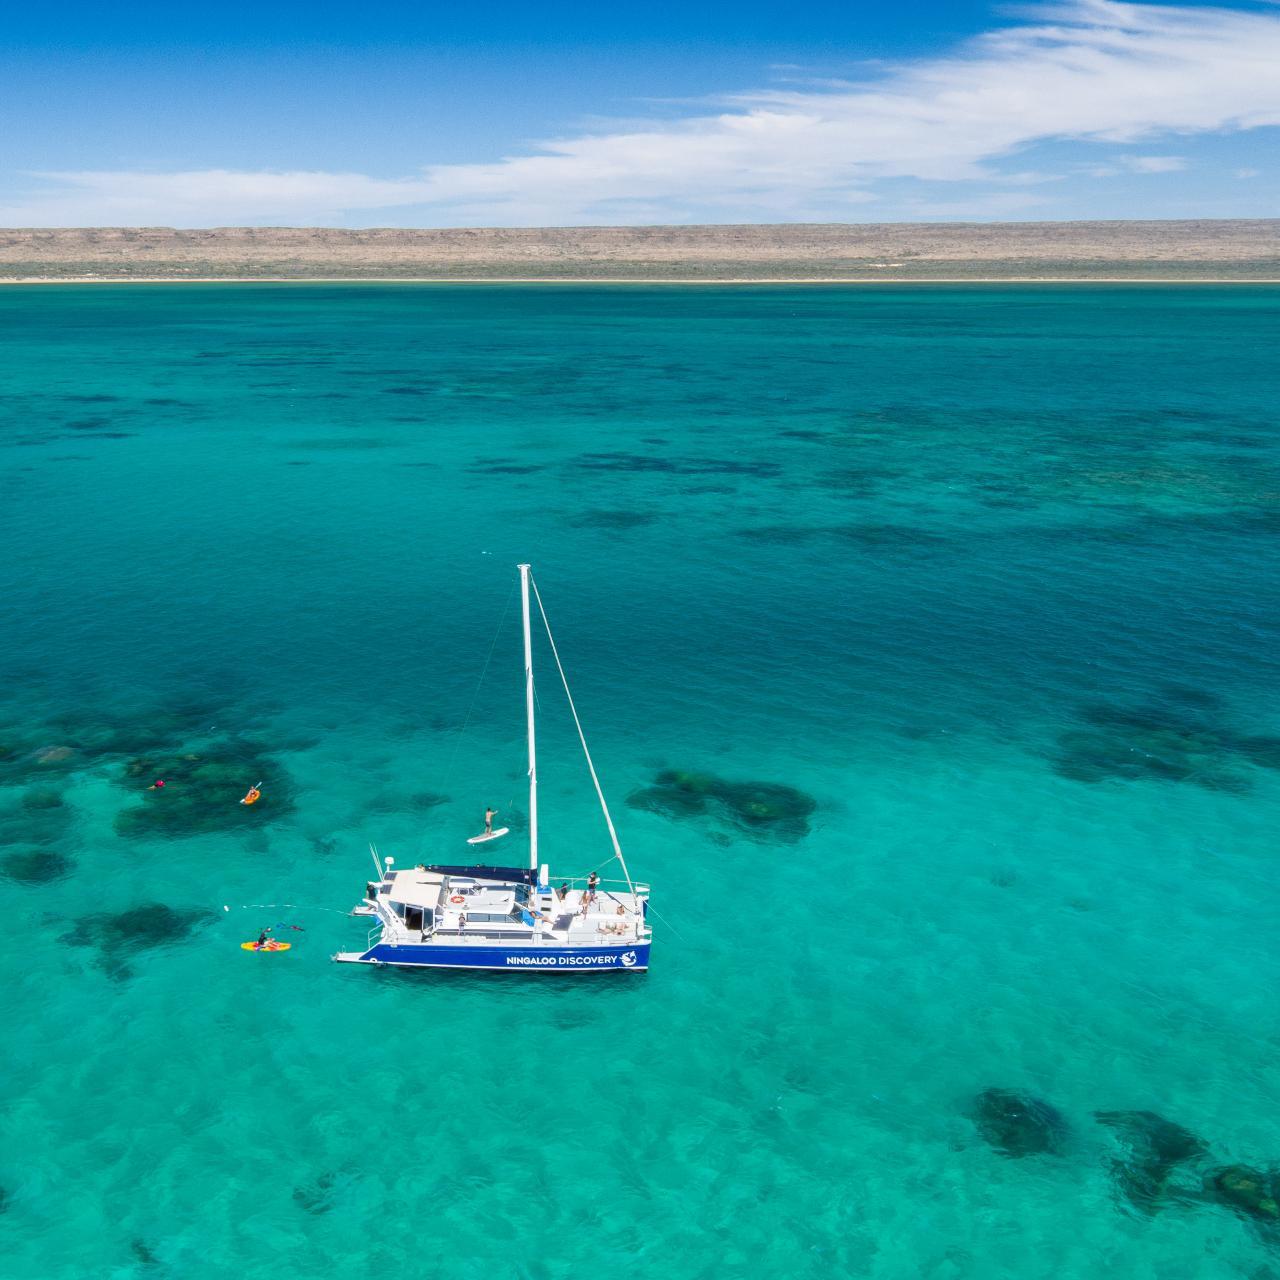 Ningaloo Whale Shark Swim & Eco Tour on a Sailing Catamaran (shoulder season)